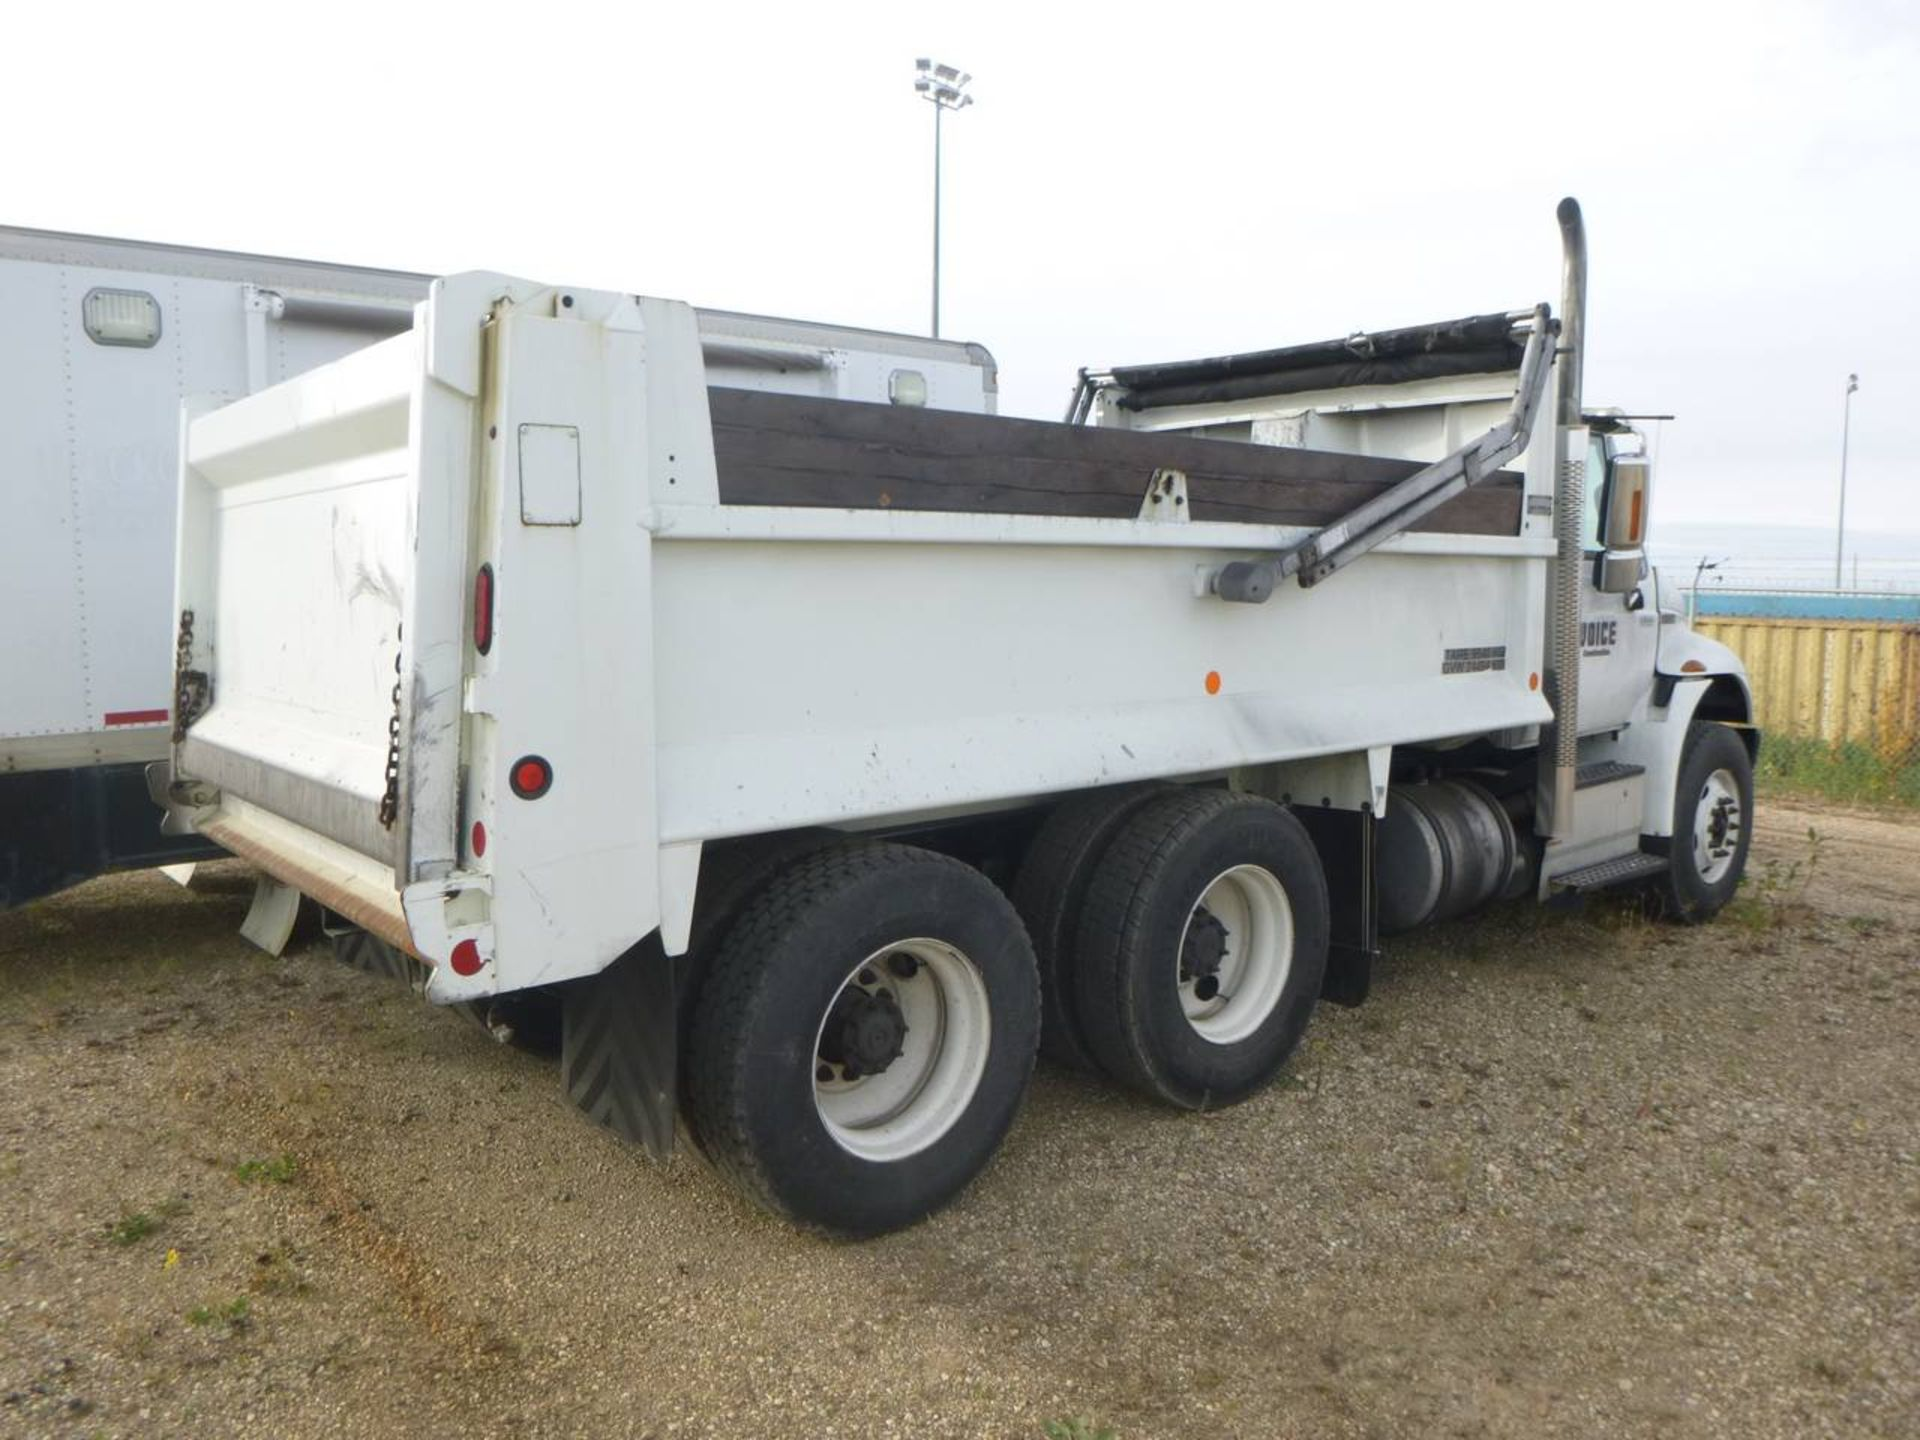 2018 International 4400 SBA 6X4 Dump Truck - Image 3 of 15